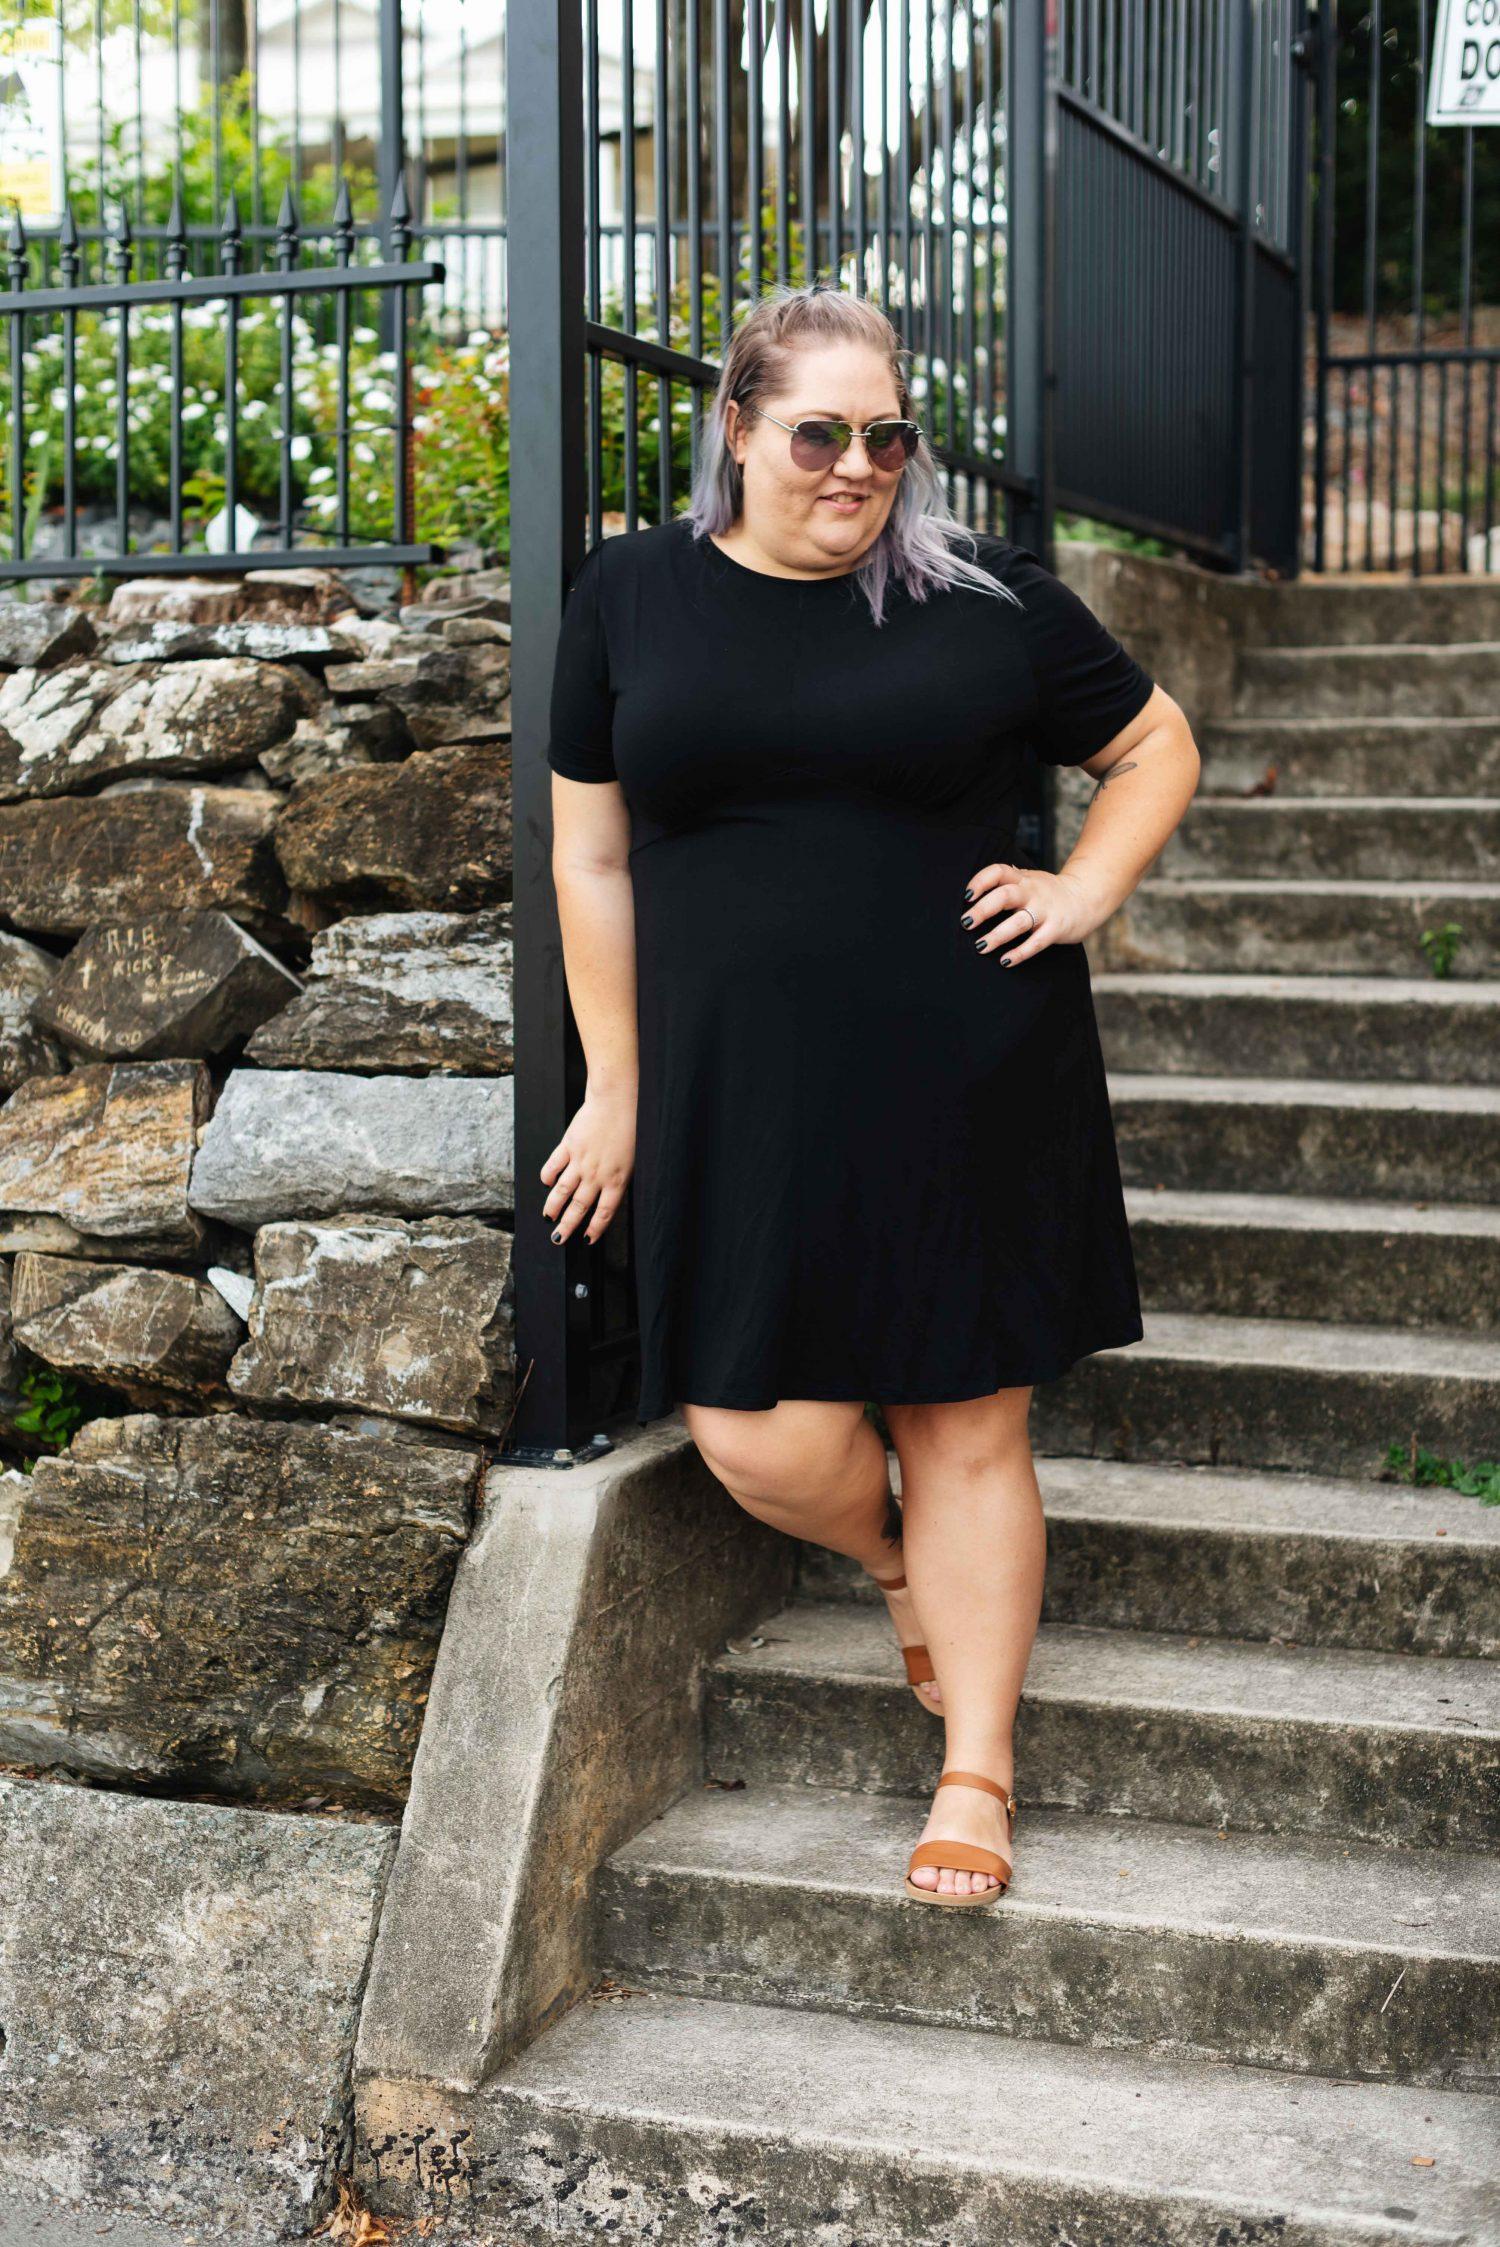 Plus Size ASOS Black Mini Dress - Suger Coat It